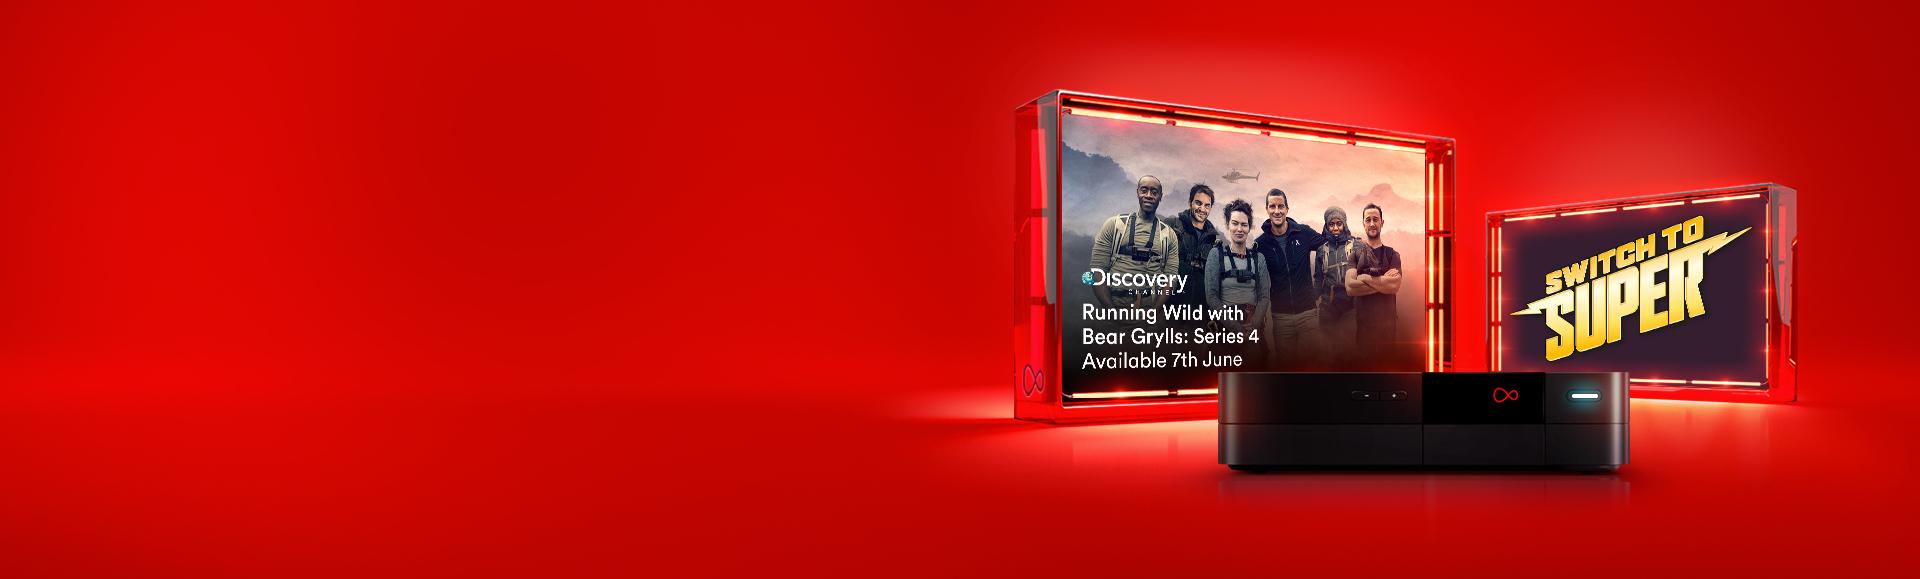 About The Full Bundle  >> Full House Bundle Get The Best Tv Broadband Deal Virgin Media